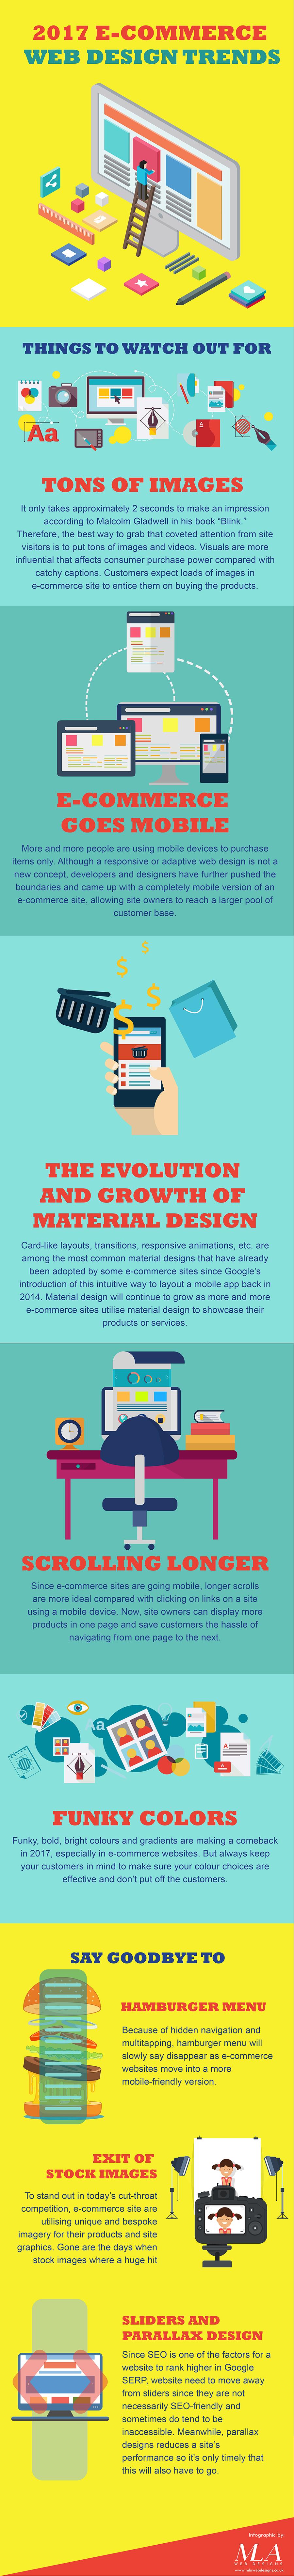 E-Commerce Web Design Trends - London eCommerce Website Designs